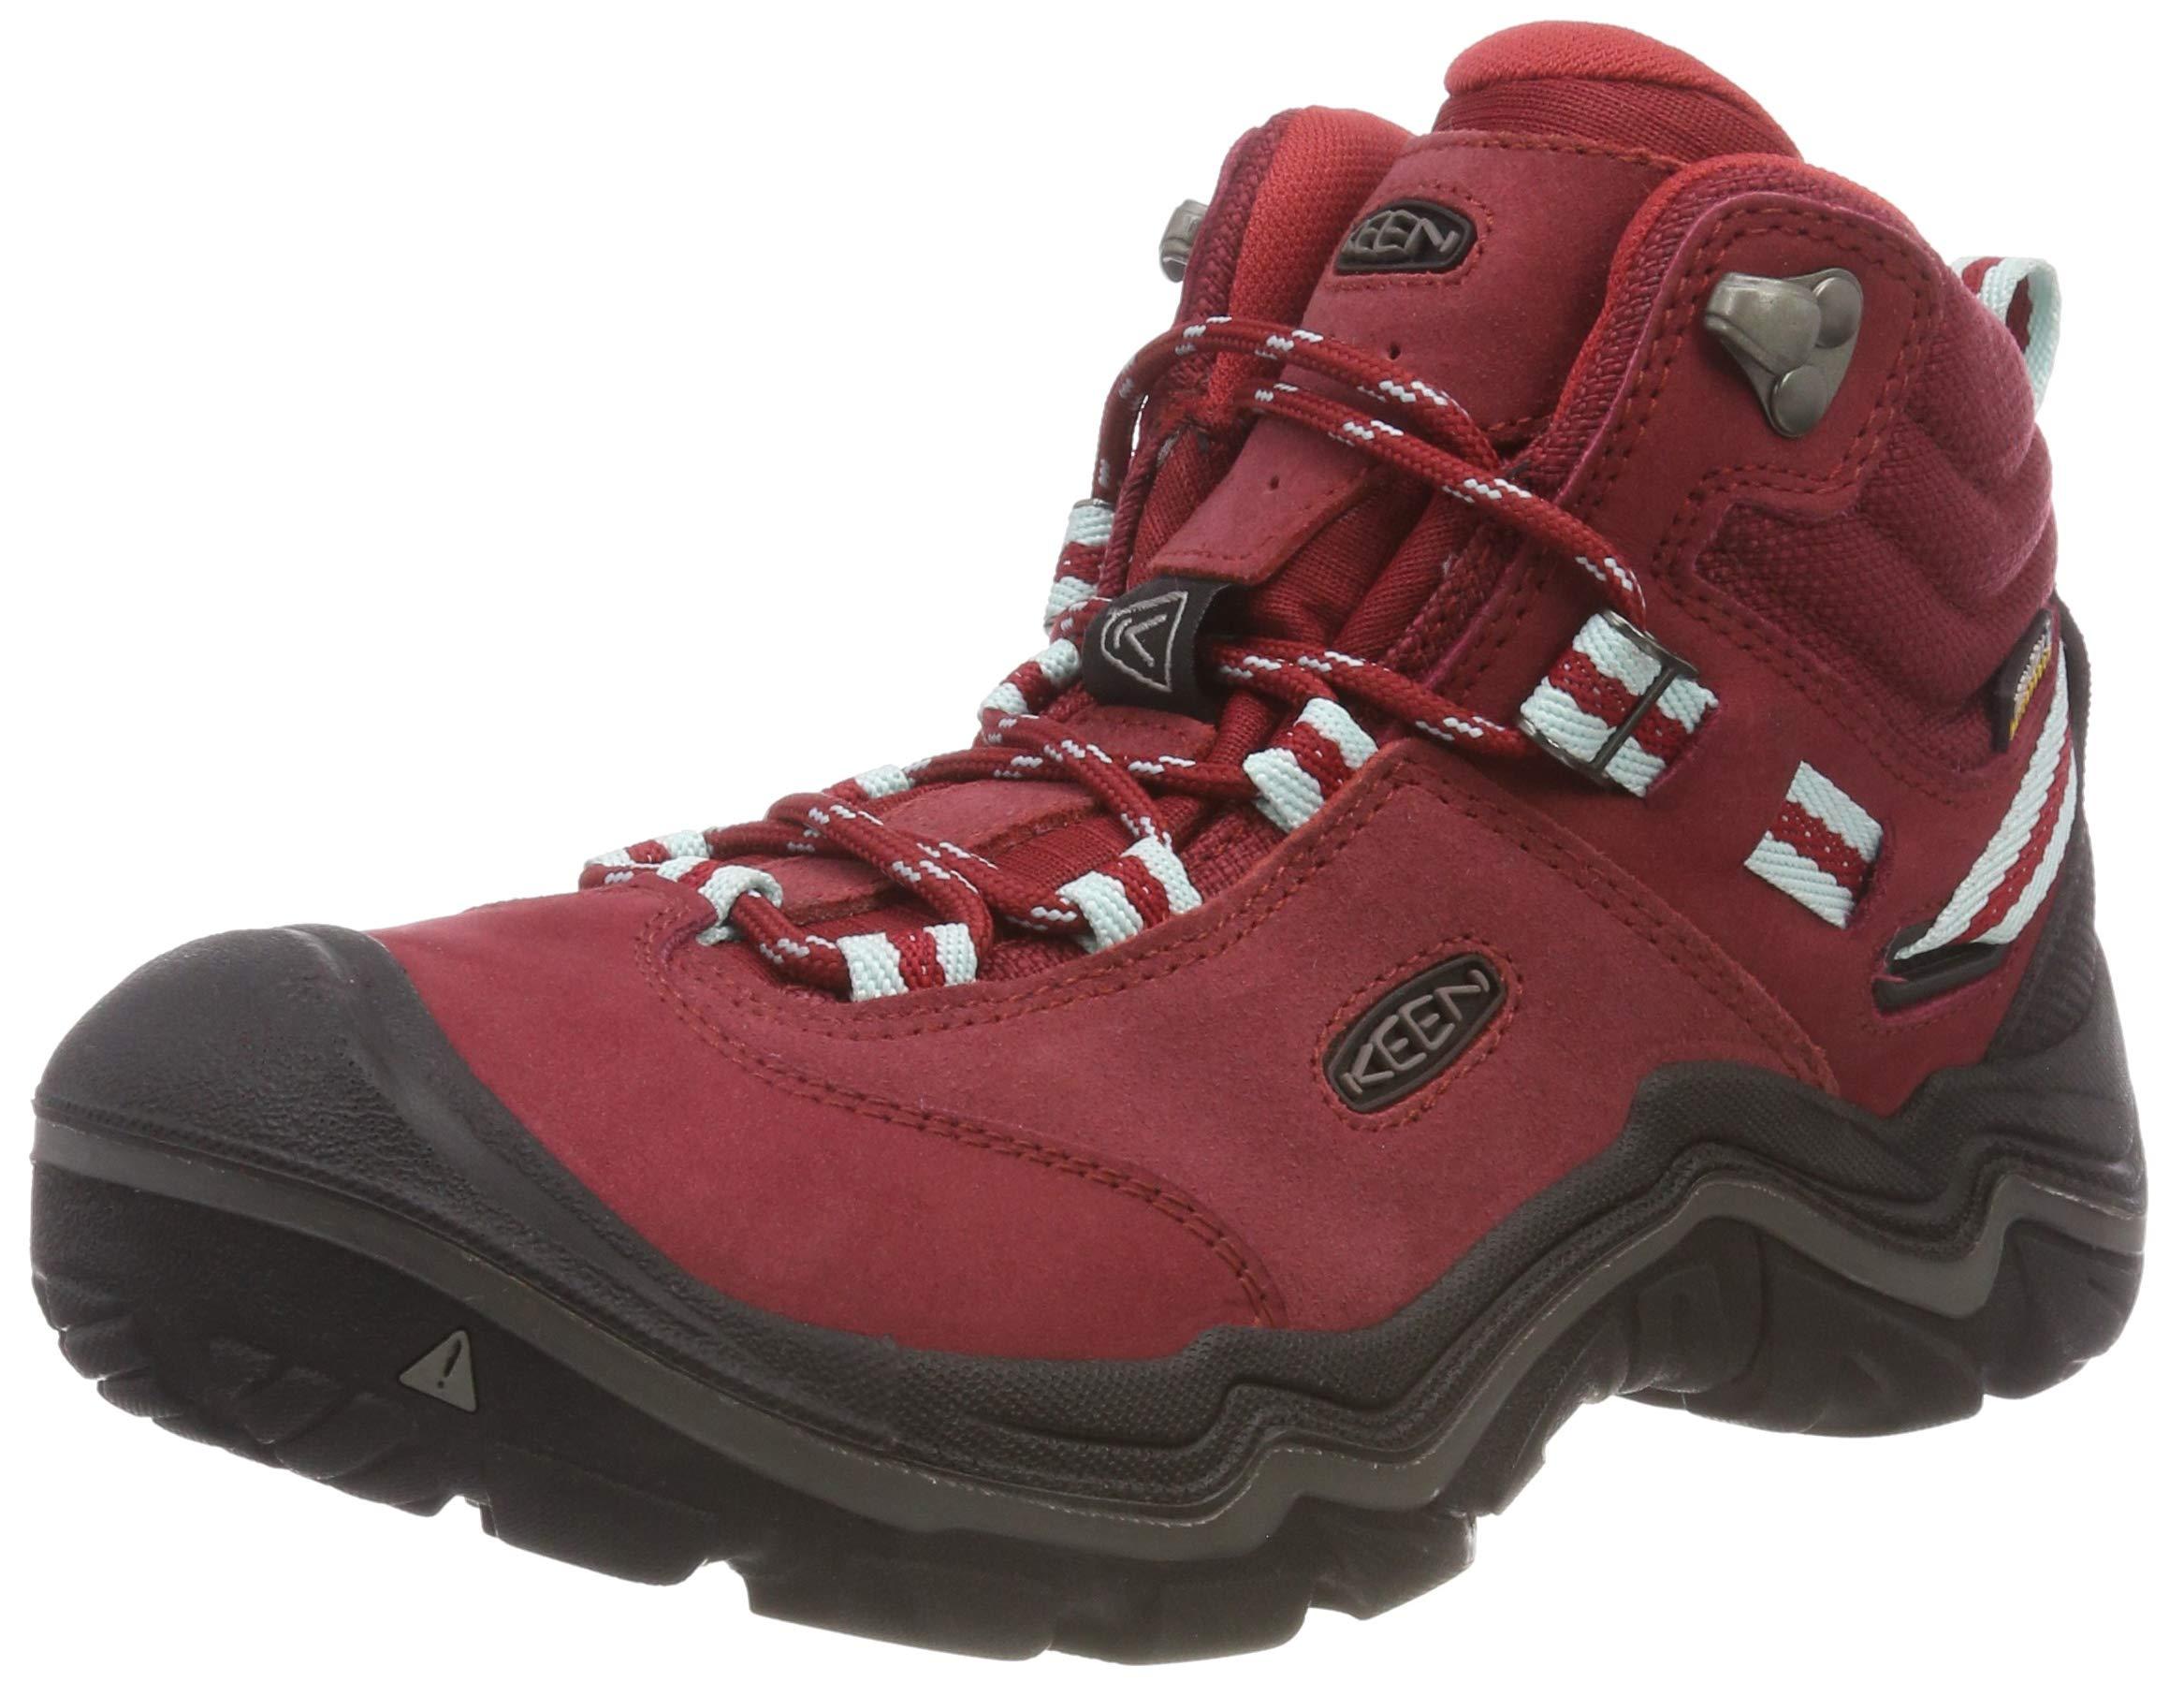 KEEN Women's Wanderer Waterproof Mid High Rise Hiking Shoes, 8.5 UK 1